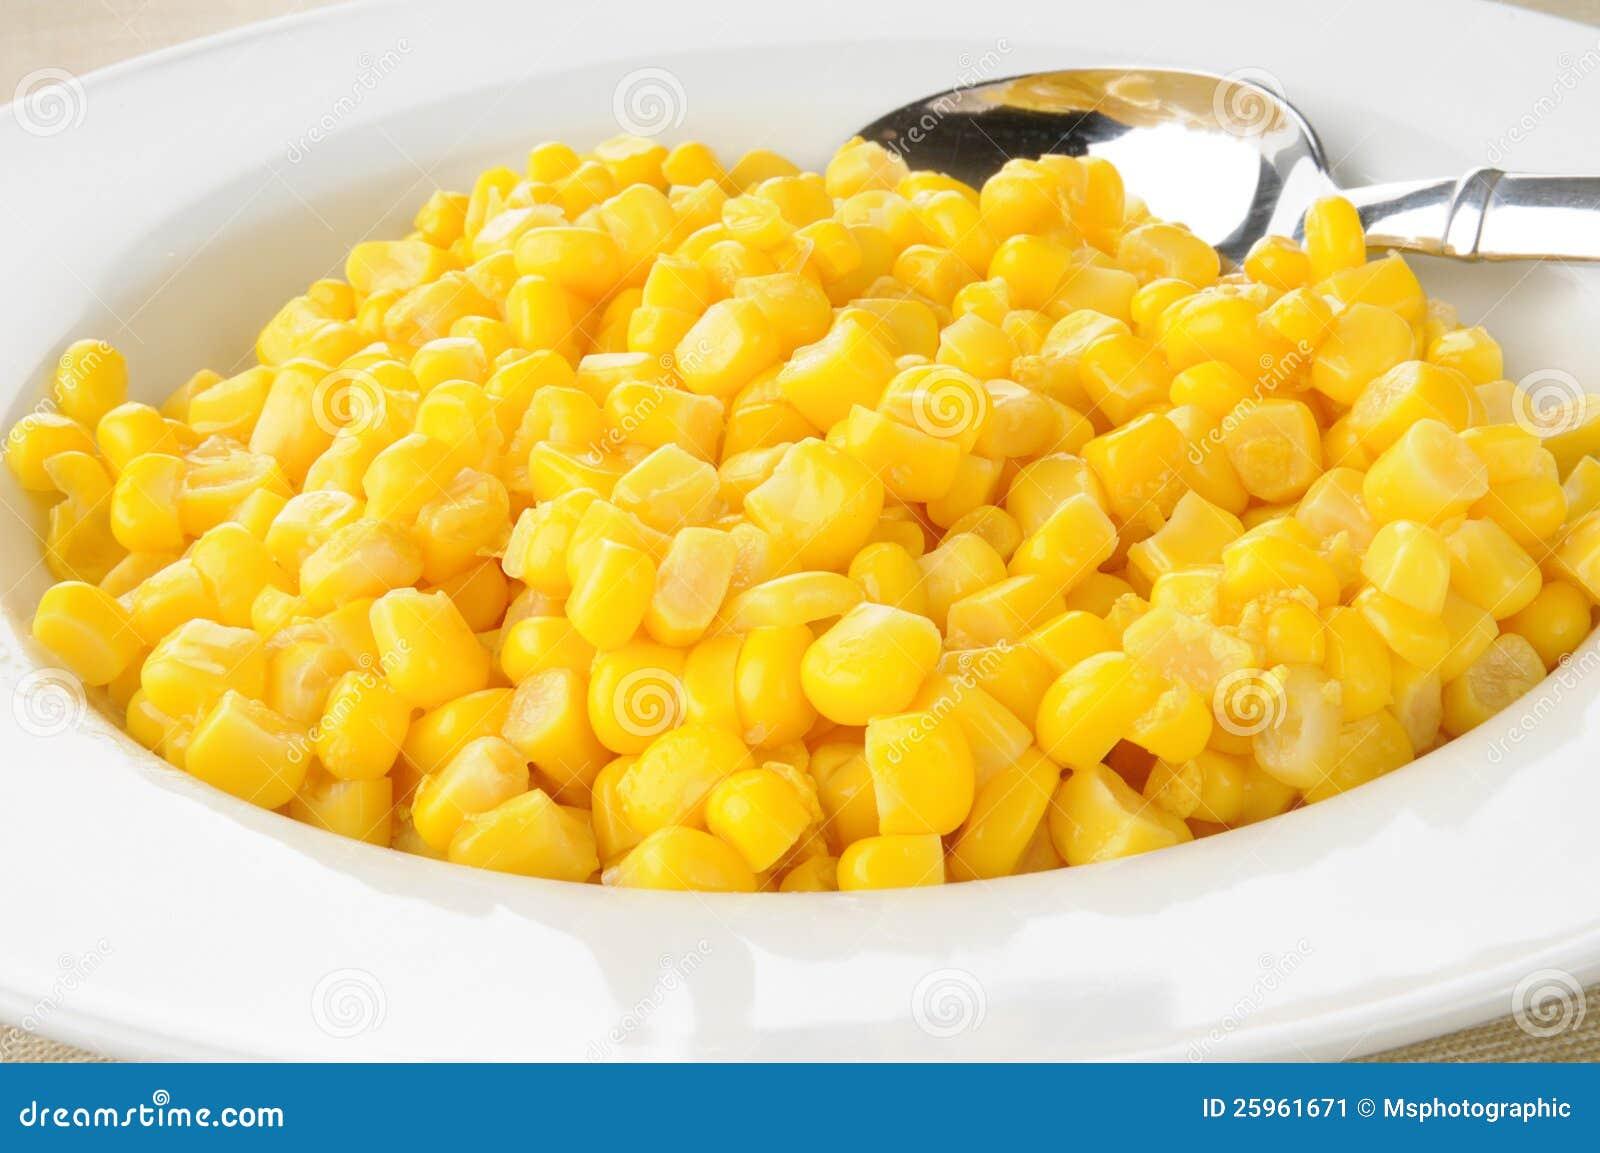 Bowl Of Corn Stock Image - Image: 25961671